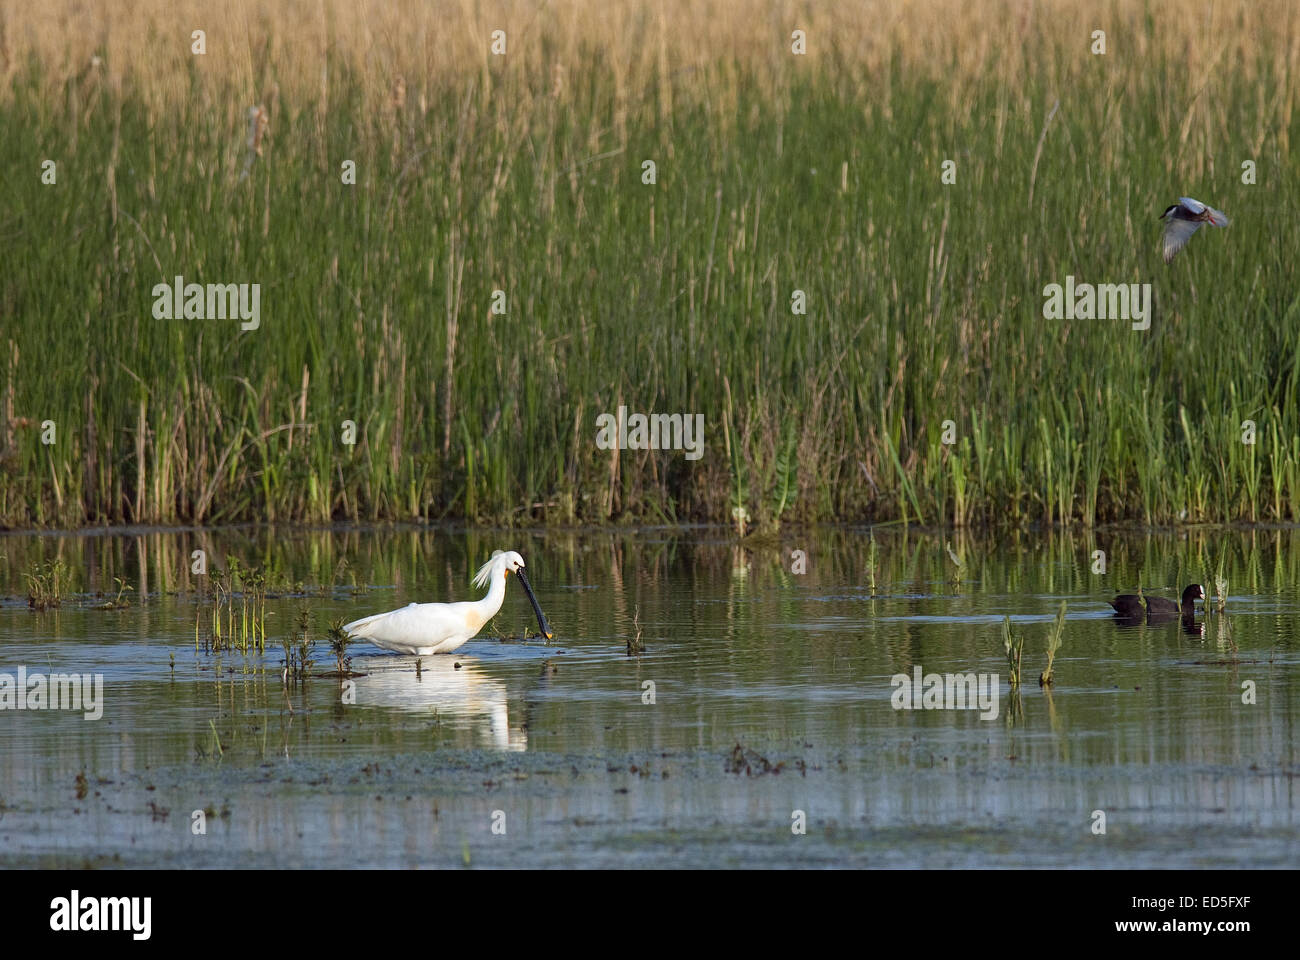 Common Spoonbill o Eurasian Spoonbill (Platalea leucorodia), Danube delta, Romania, Europe - Stock Image